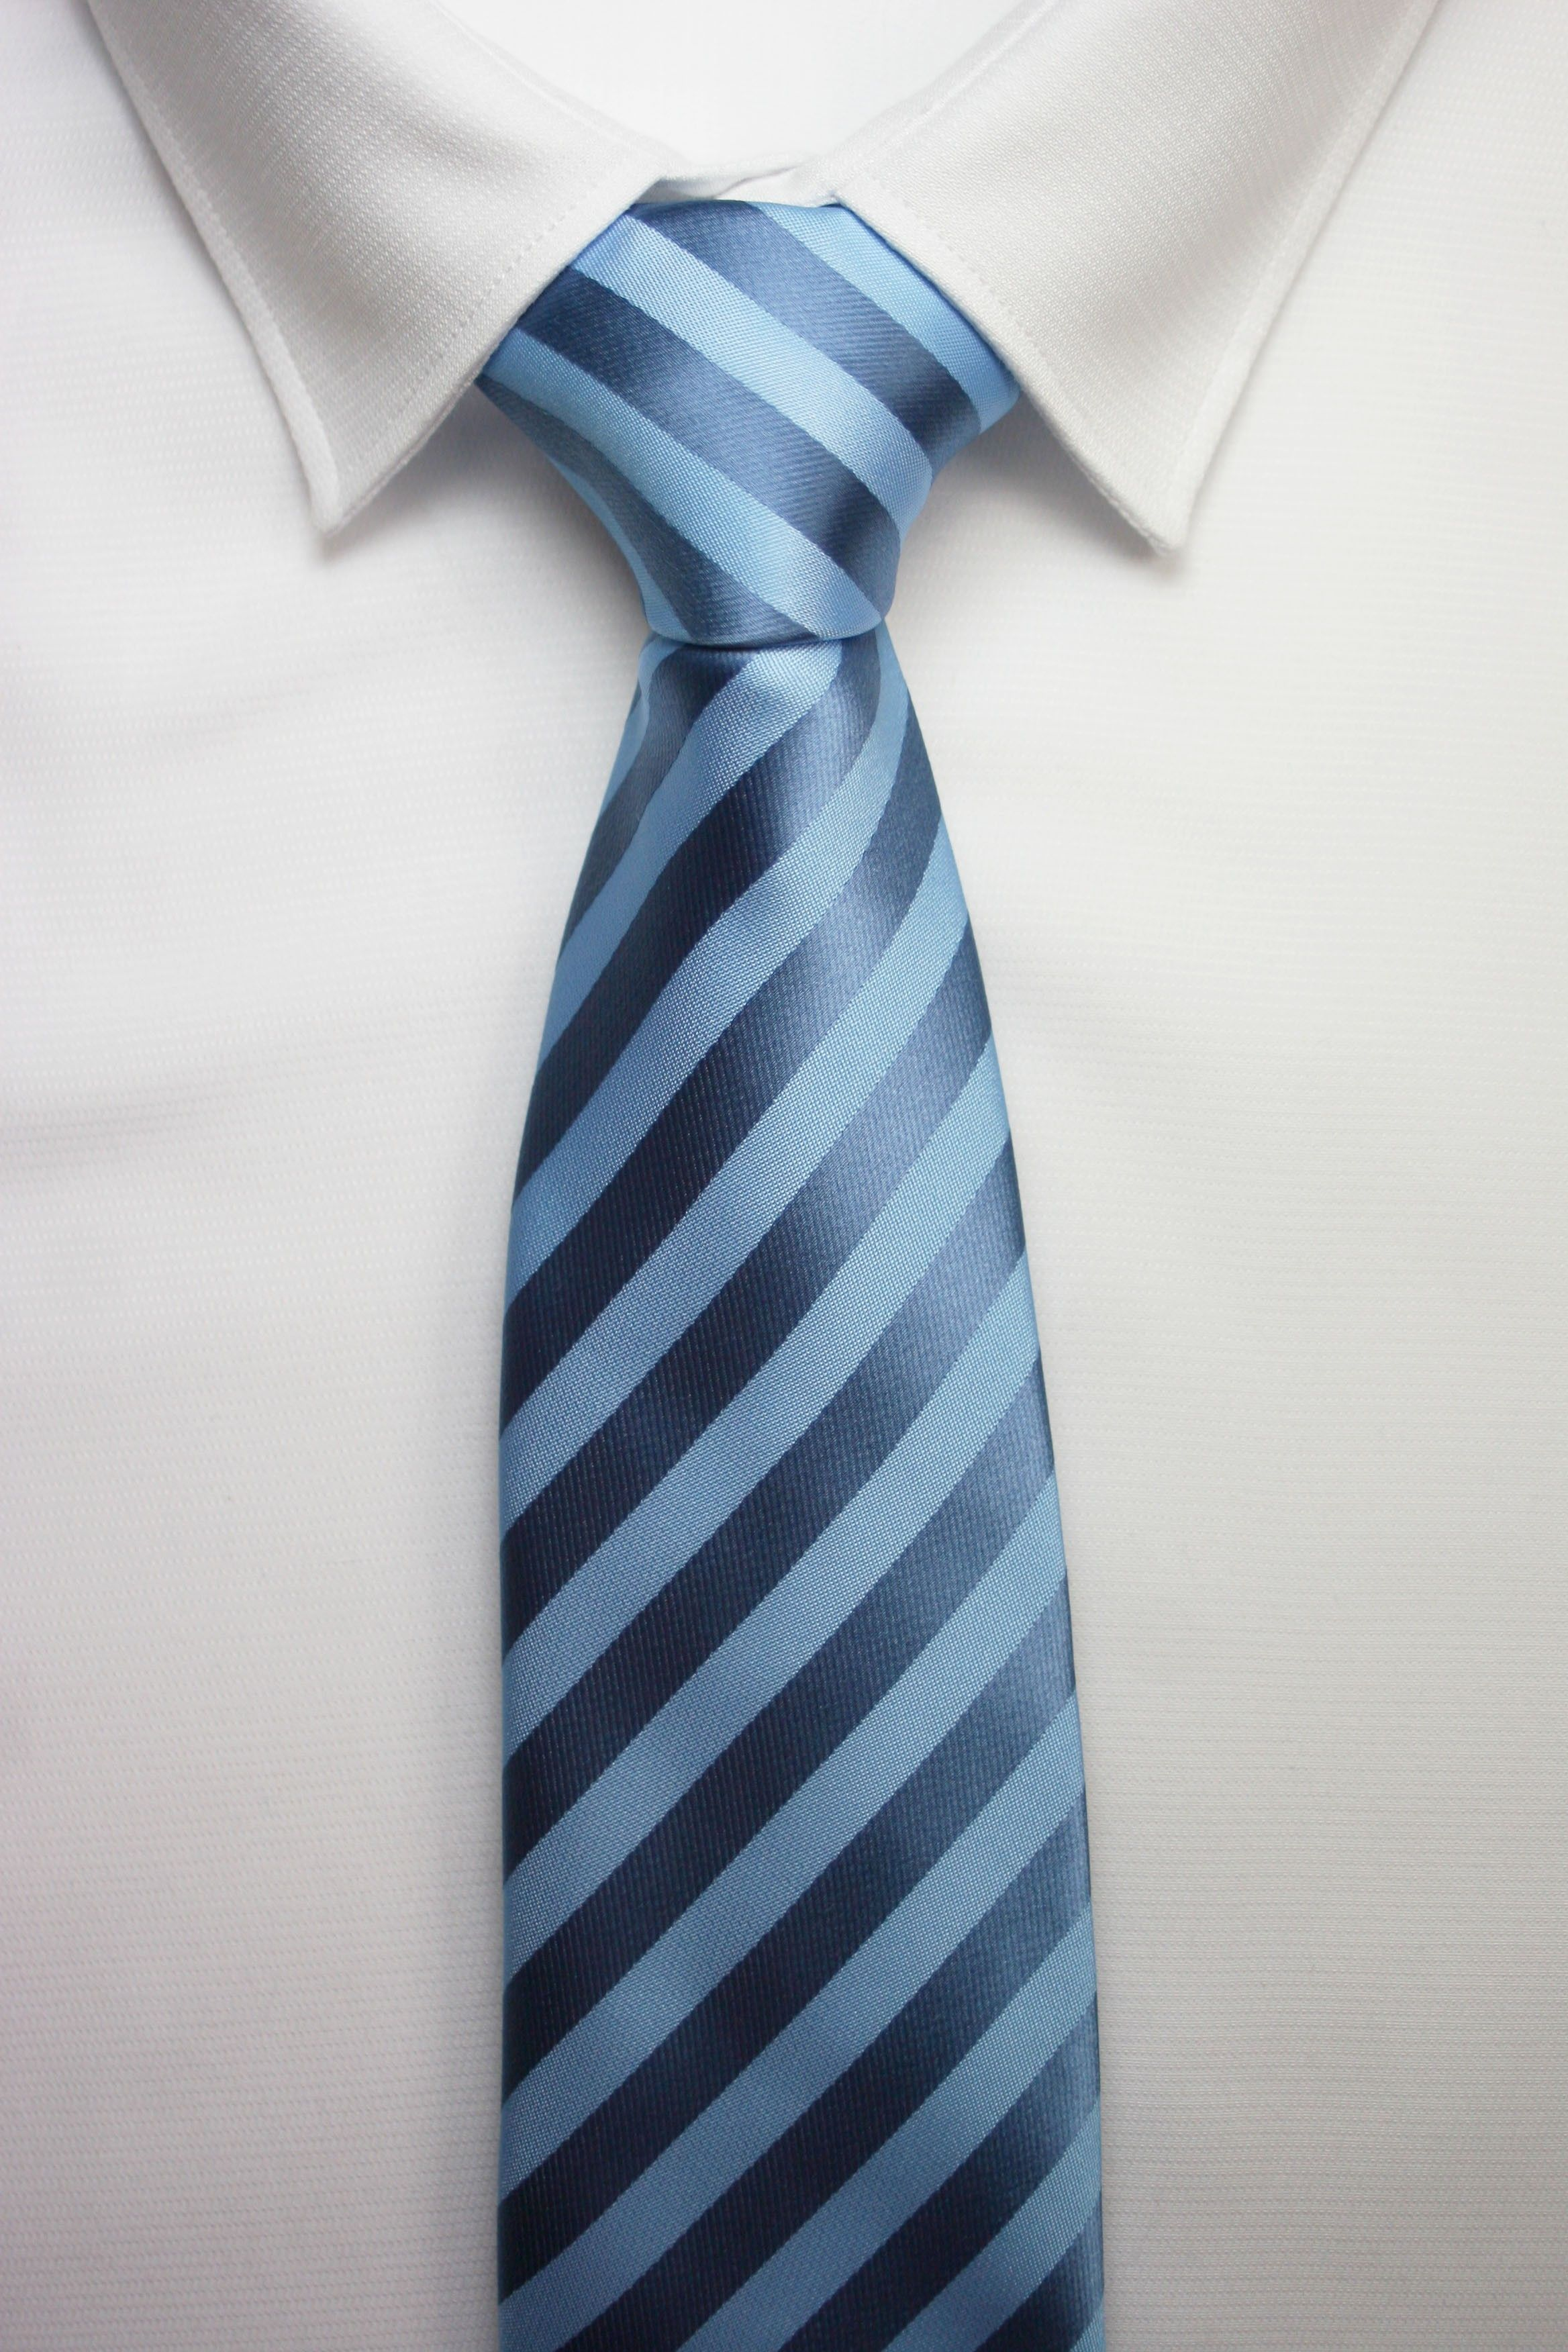 Corbatas para hombre, corbatas clásicas para hombre